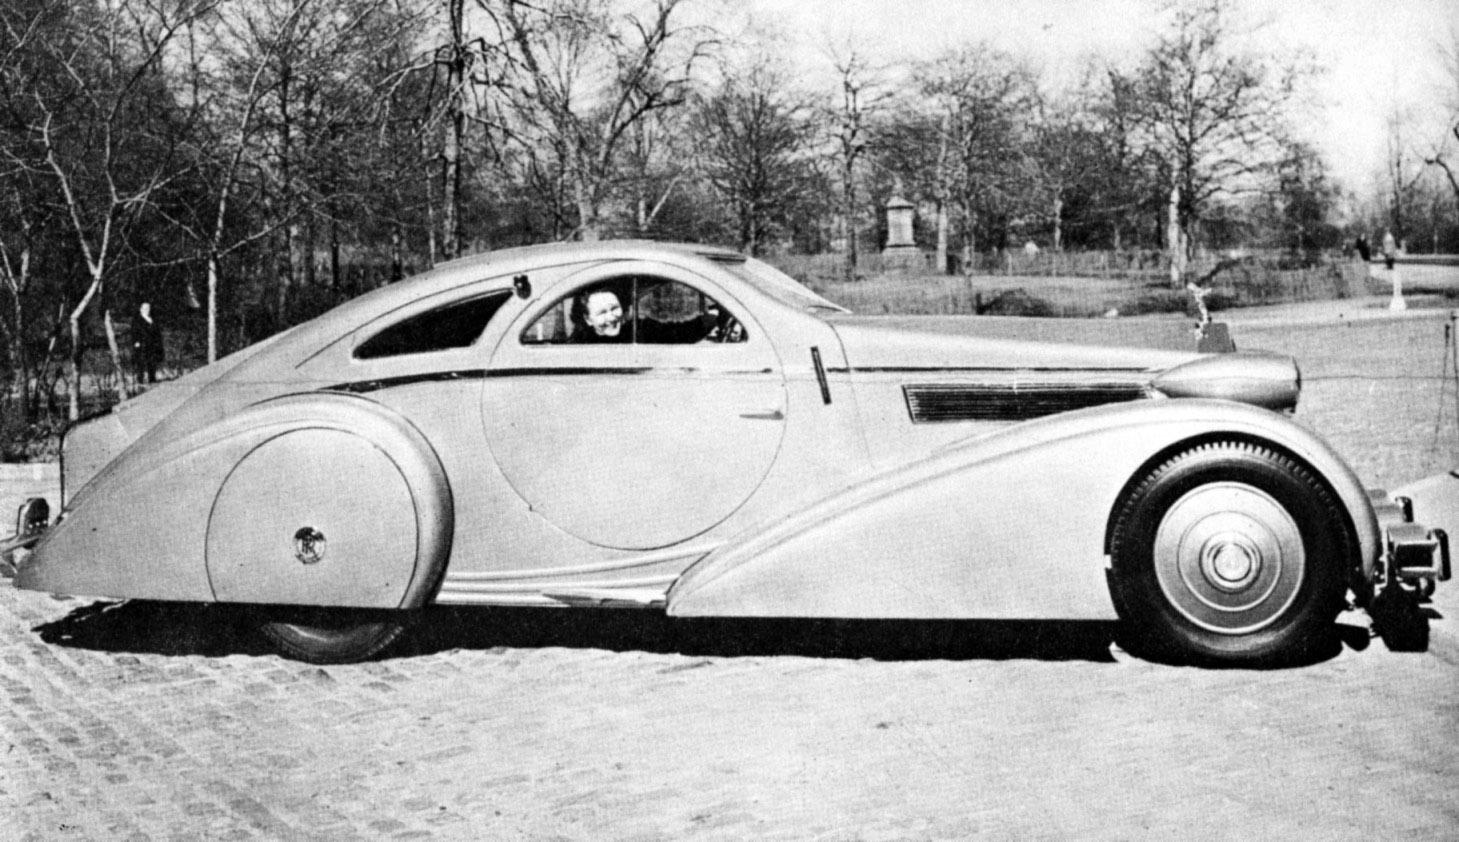 Amazing 1925 Rolls-royce Phantom Pictures & Backgrounds